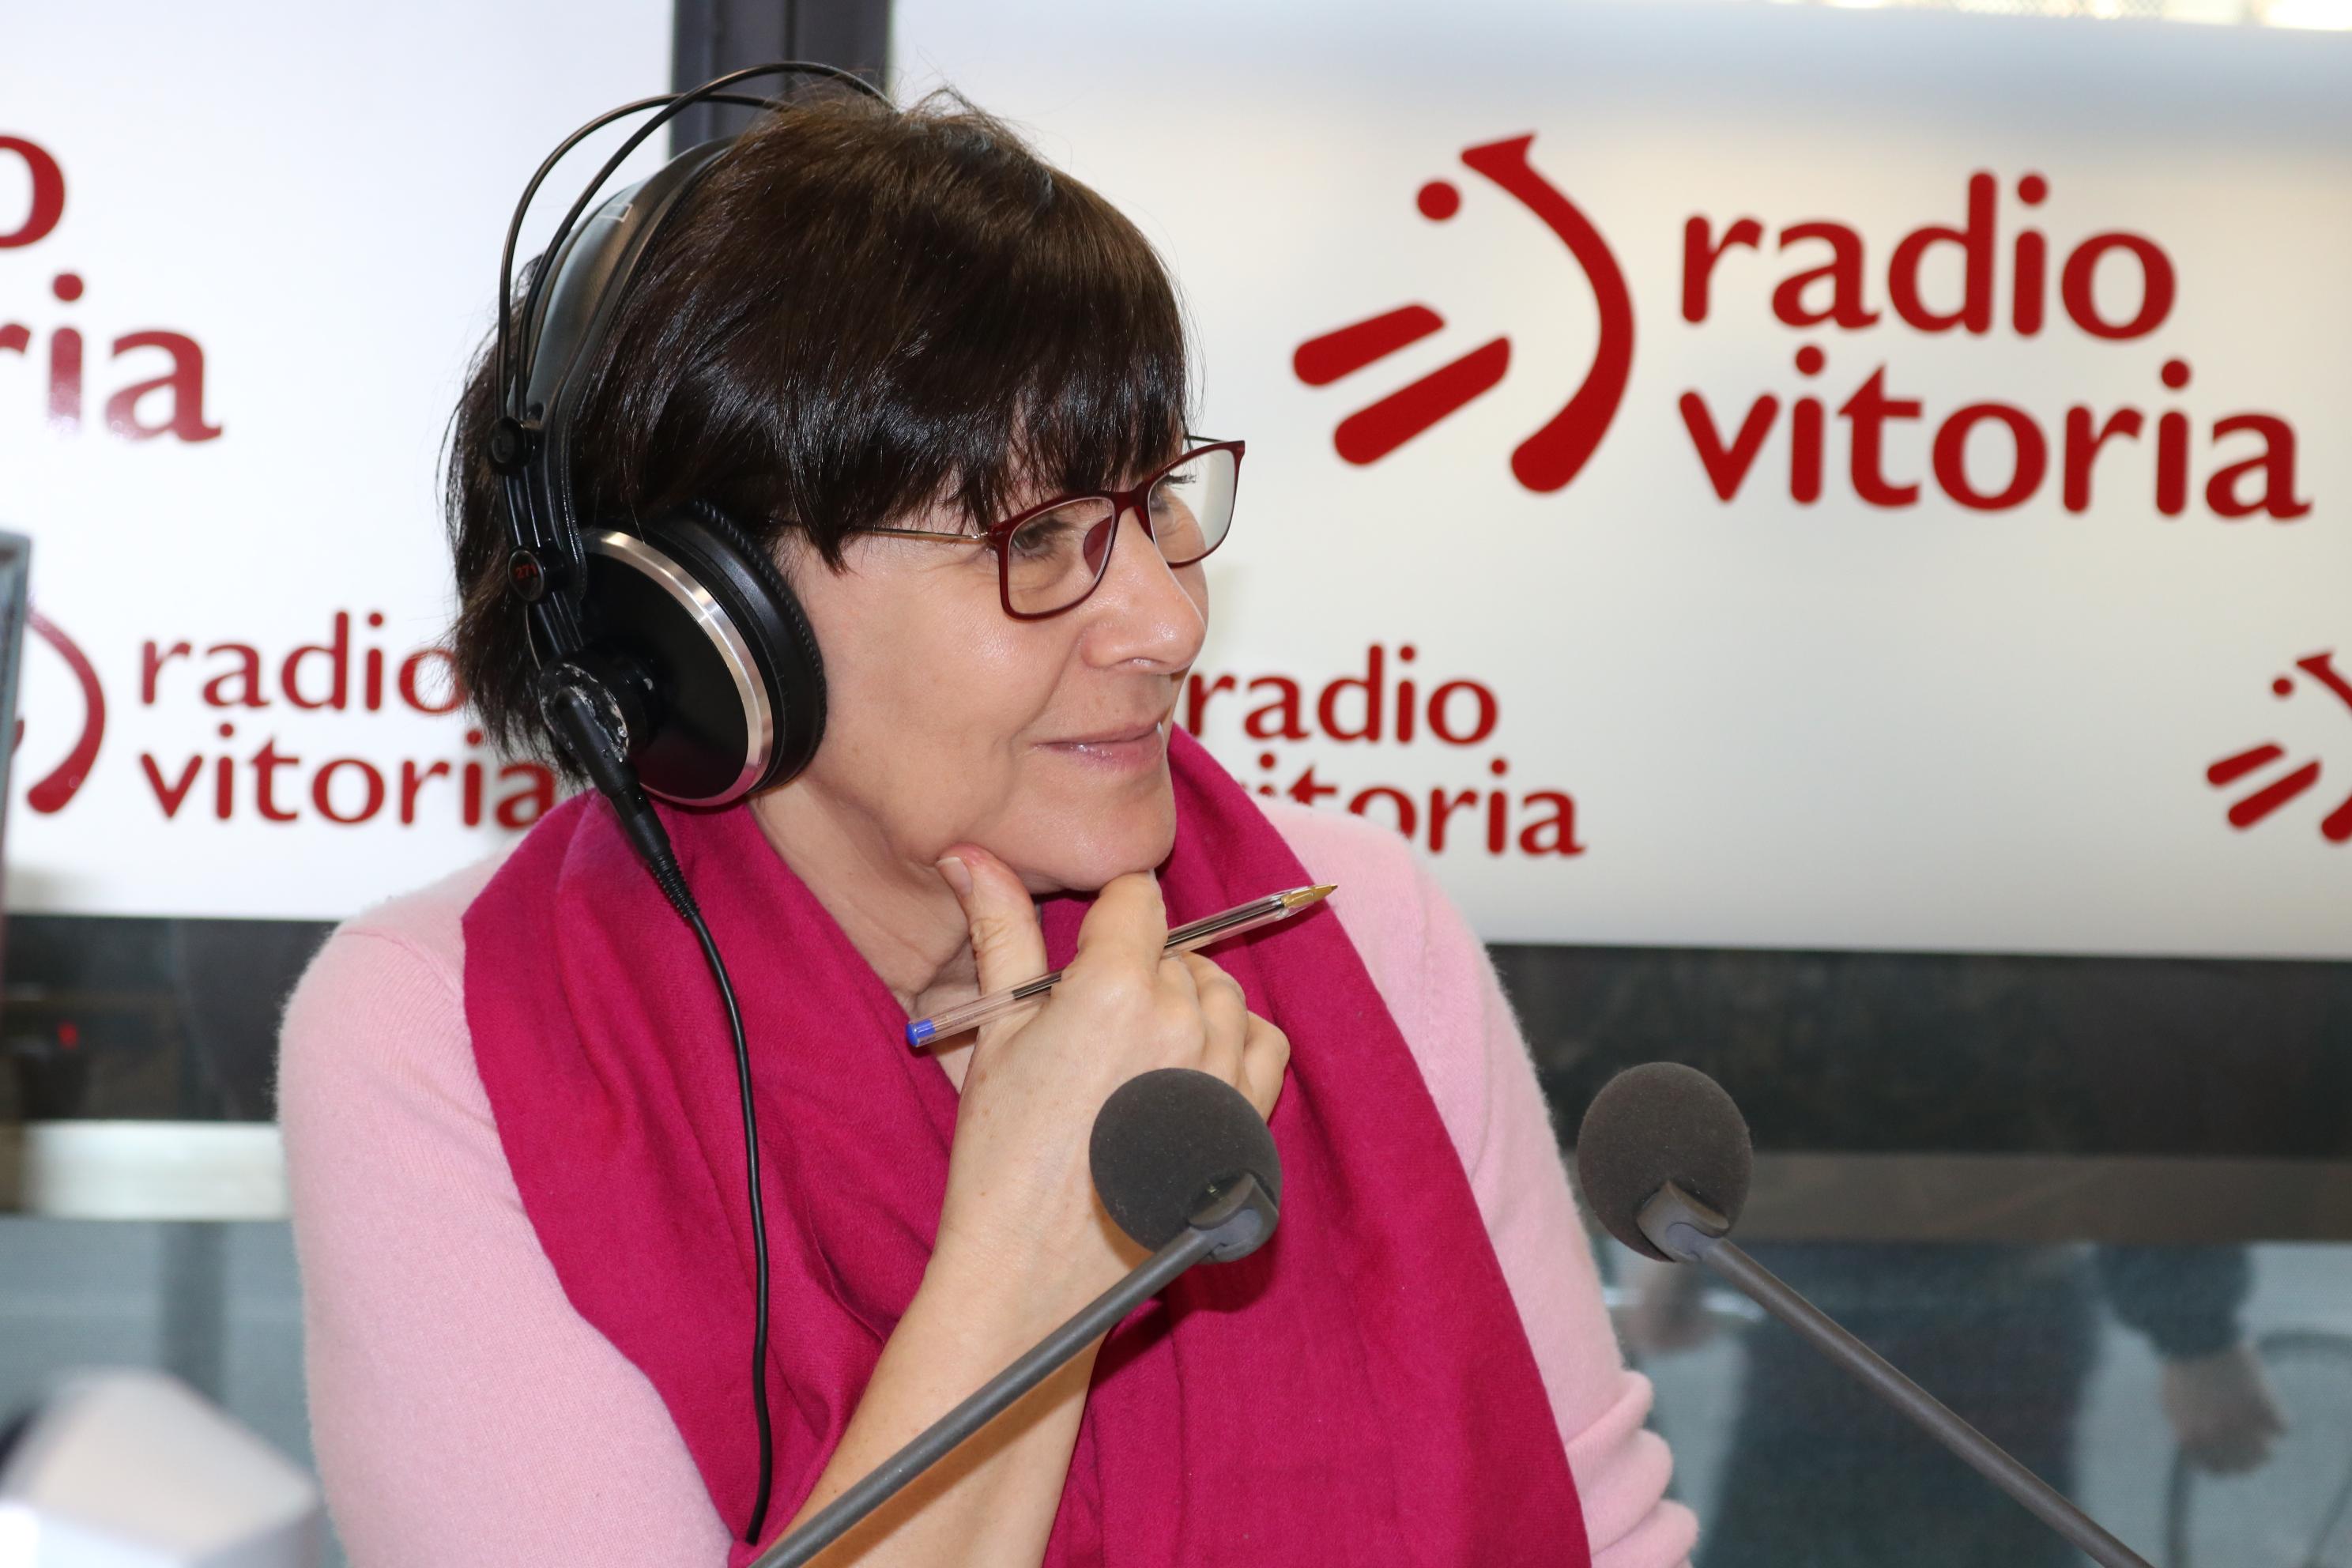 radio_vitoria_03.jpg